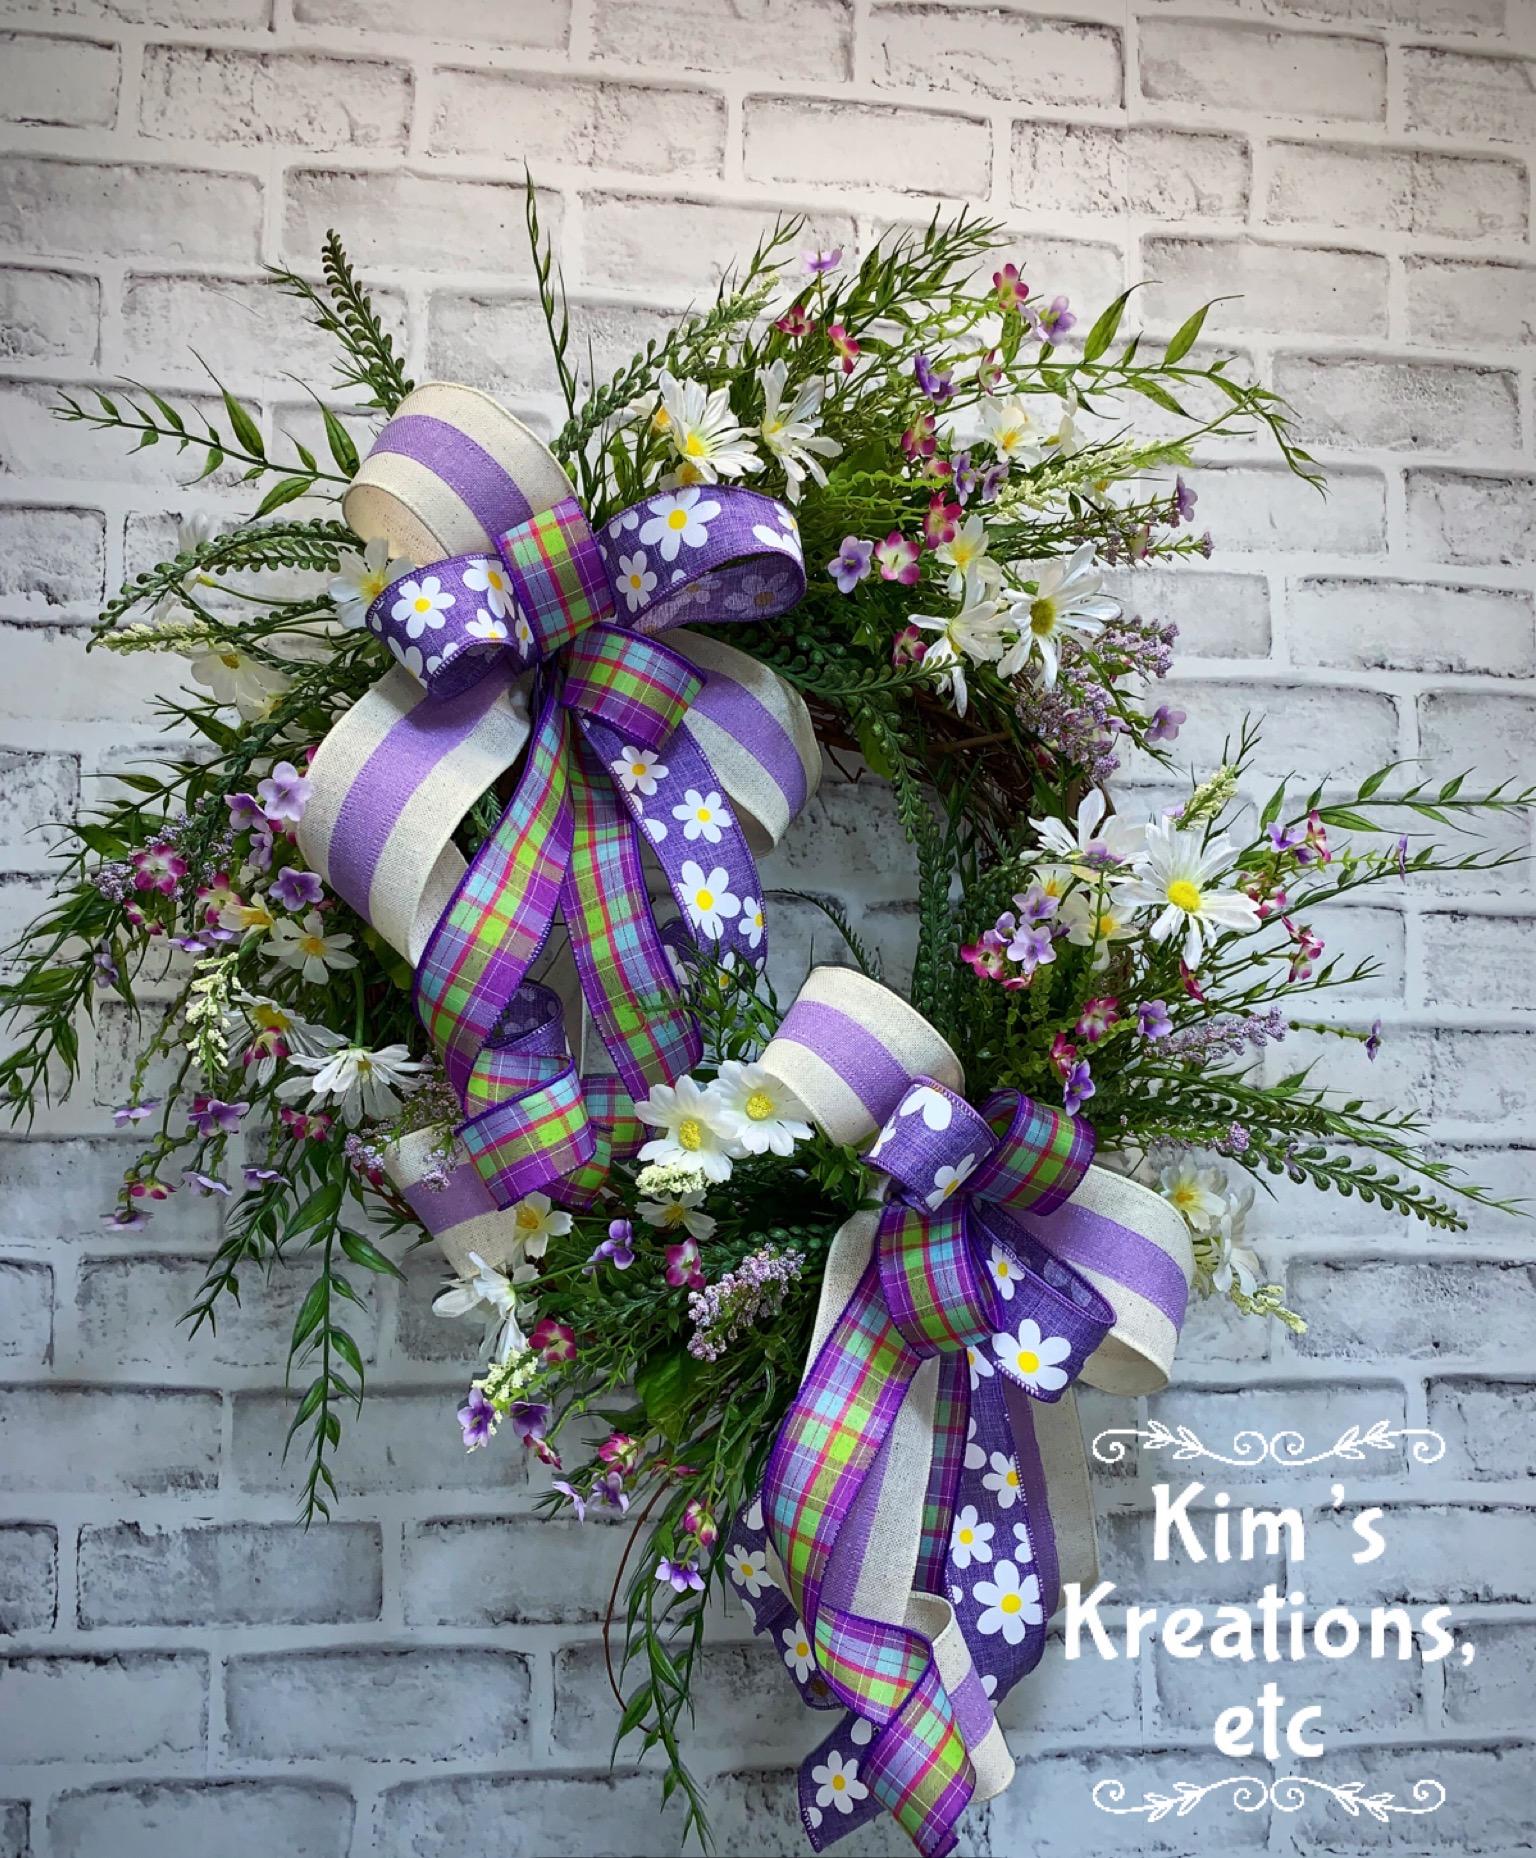 Spring Wreath Free Shipping Summer Wreath Purple Lavender Wreath Wildflower Wreath Front Door Wreath For Summer Door Wreath Decorative Wreath Grapevine Wreath Wispy Wildflower Wreath Summer Decor Home Decor Handmade Wreaths Wreaths